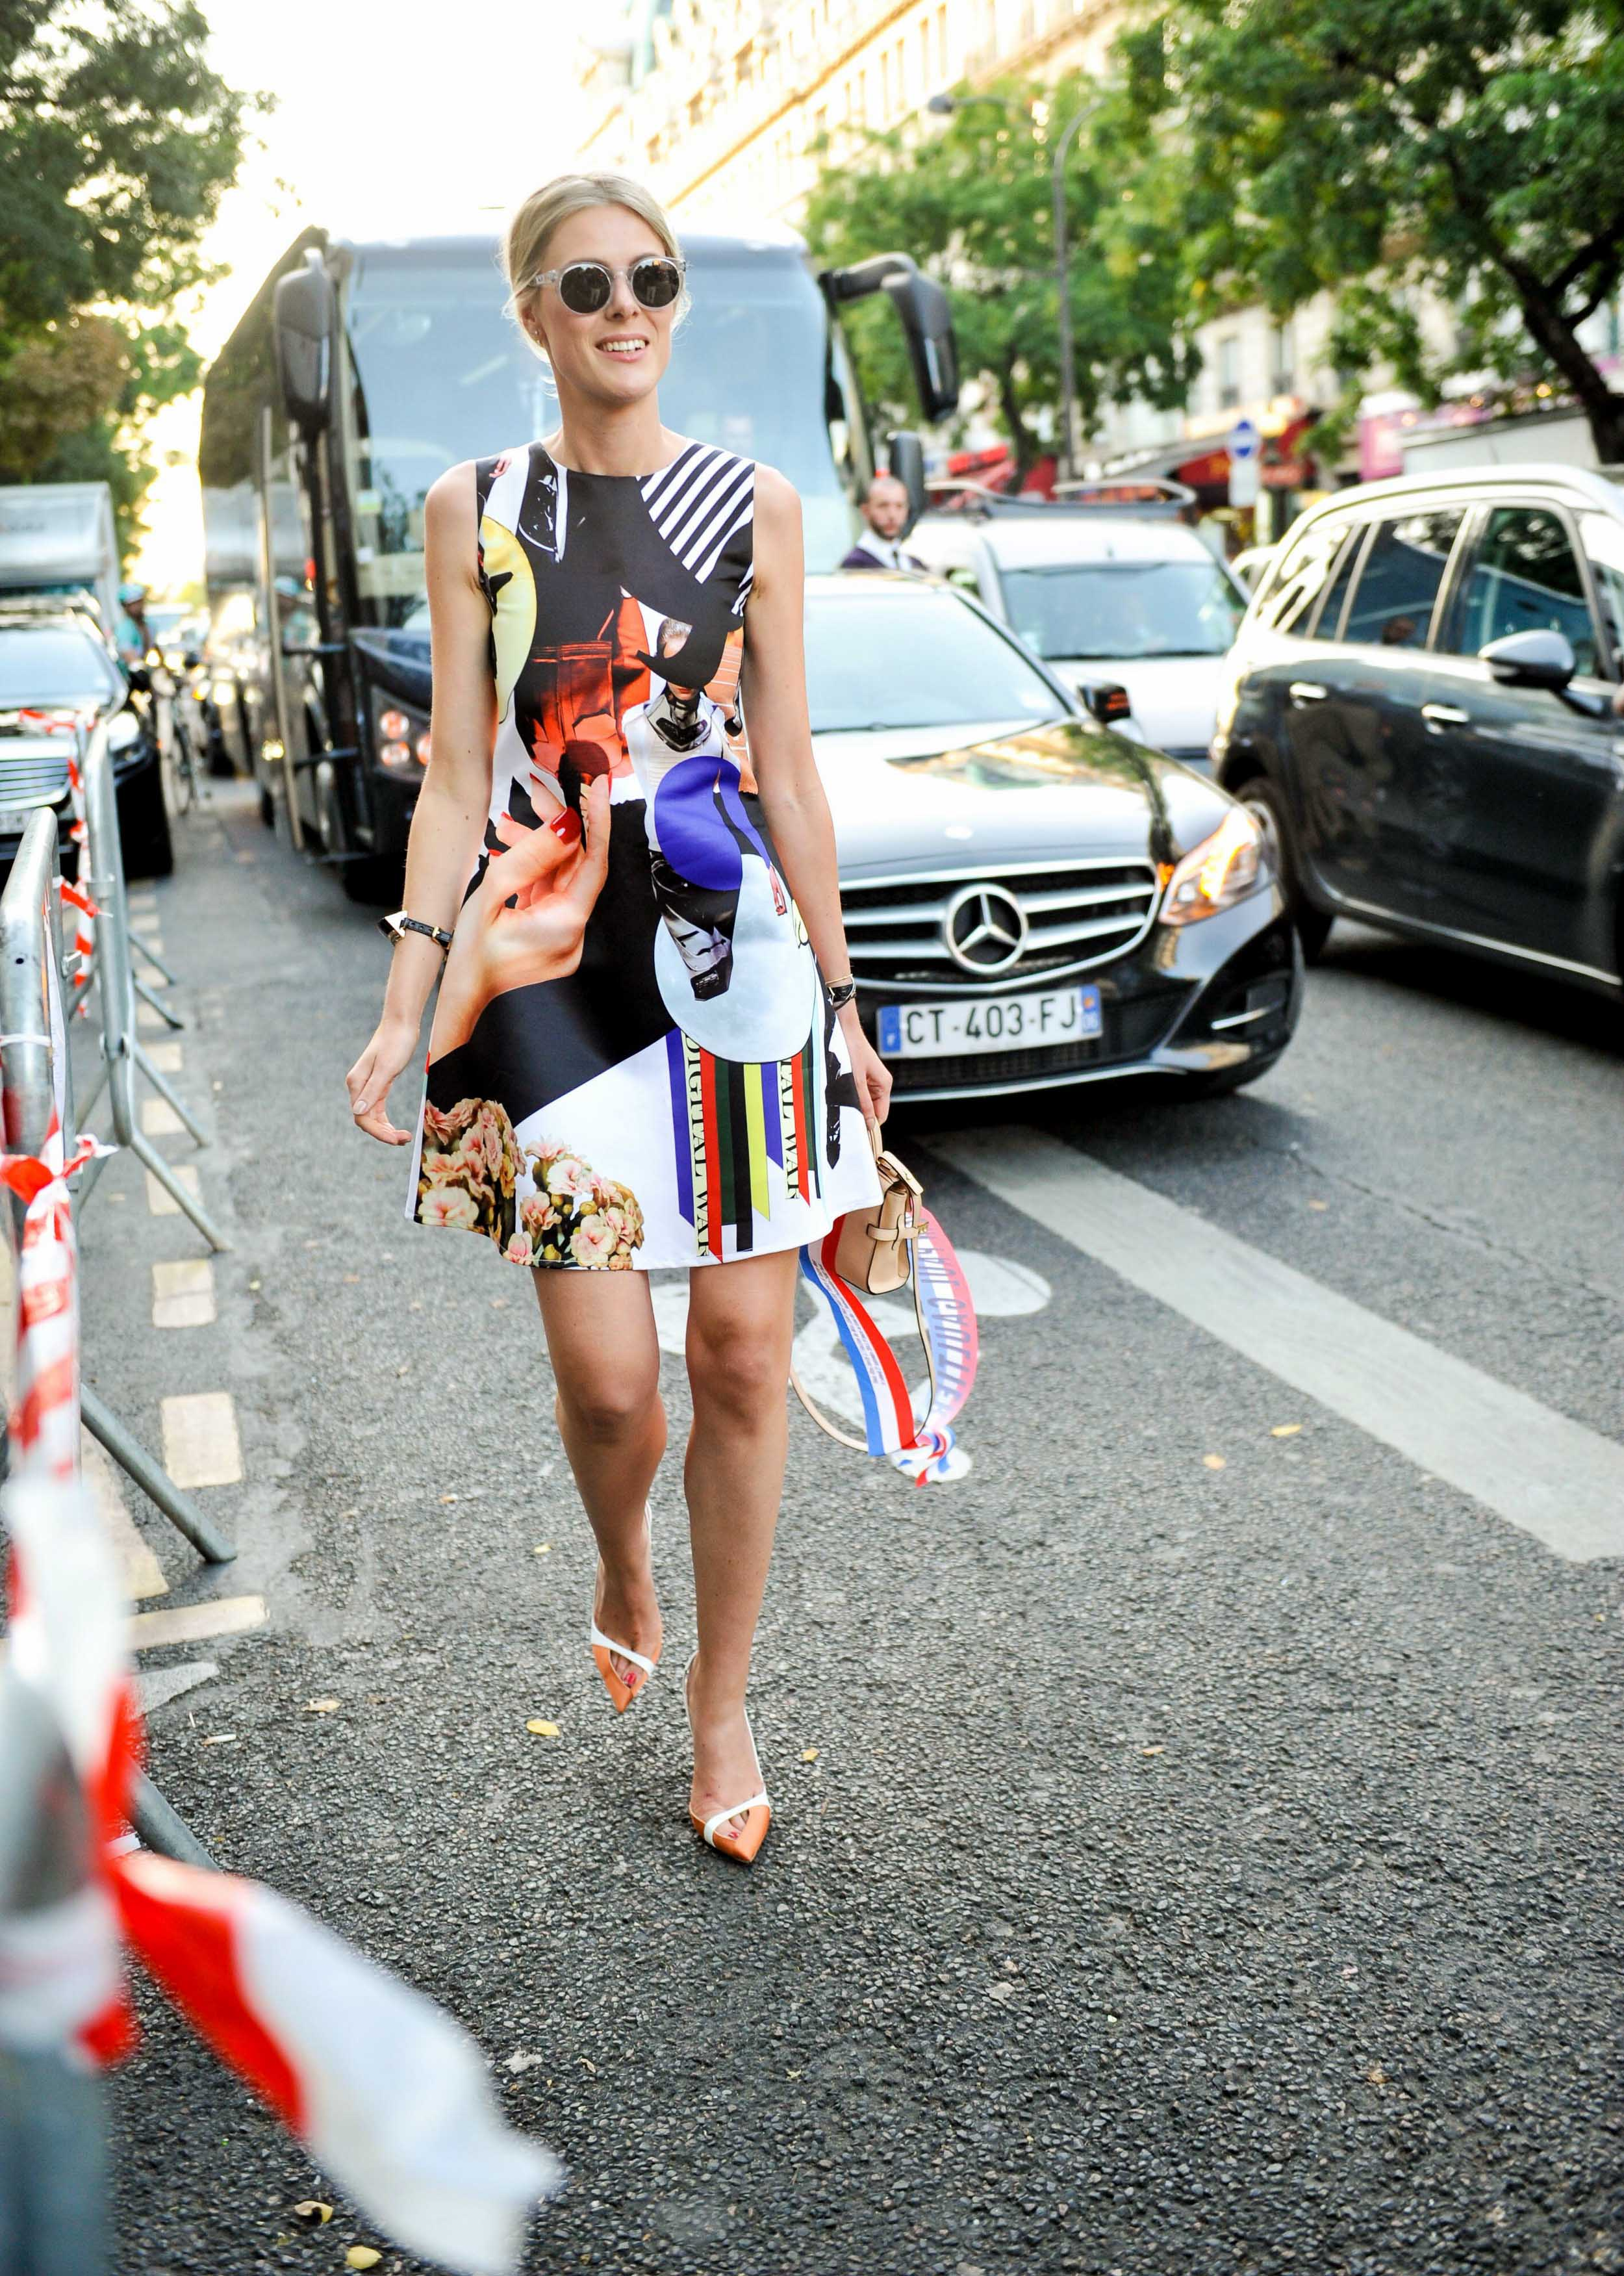 StreetStyle_ParisFashionWeek_LeandroJusten_126.jpg